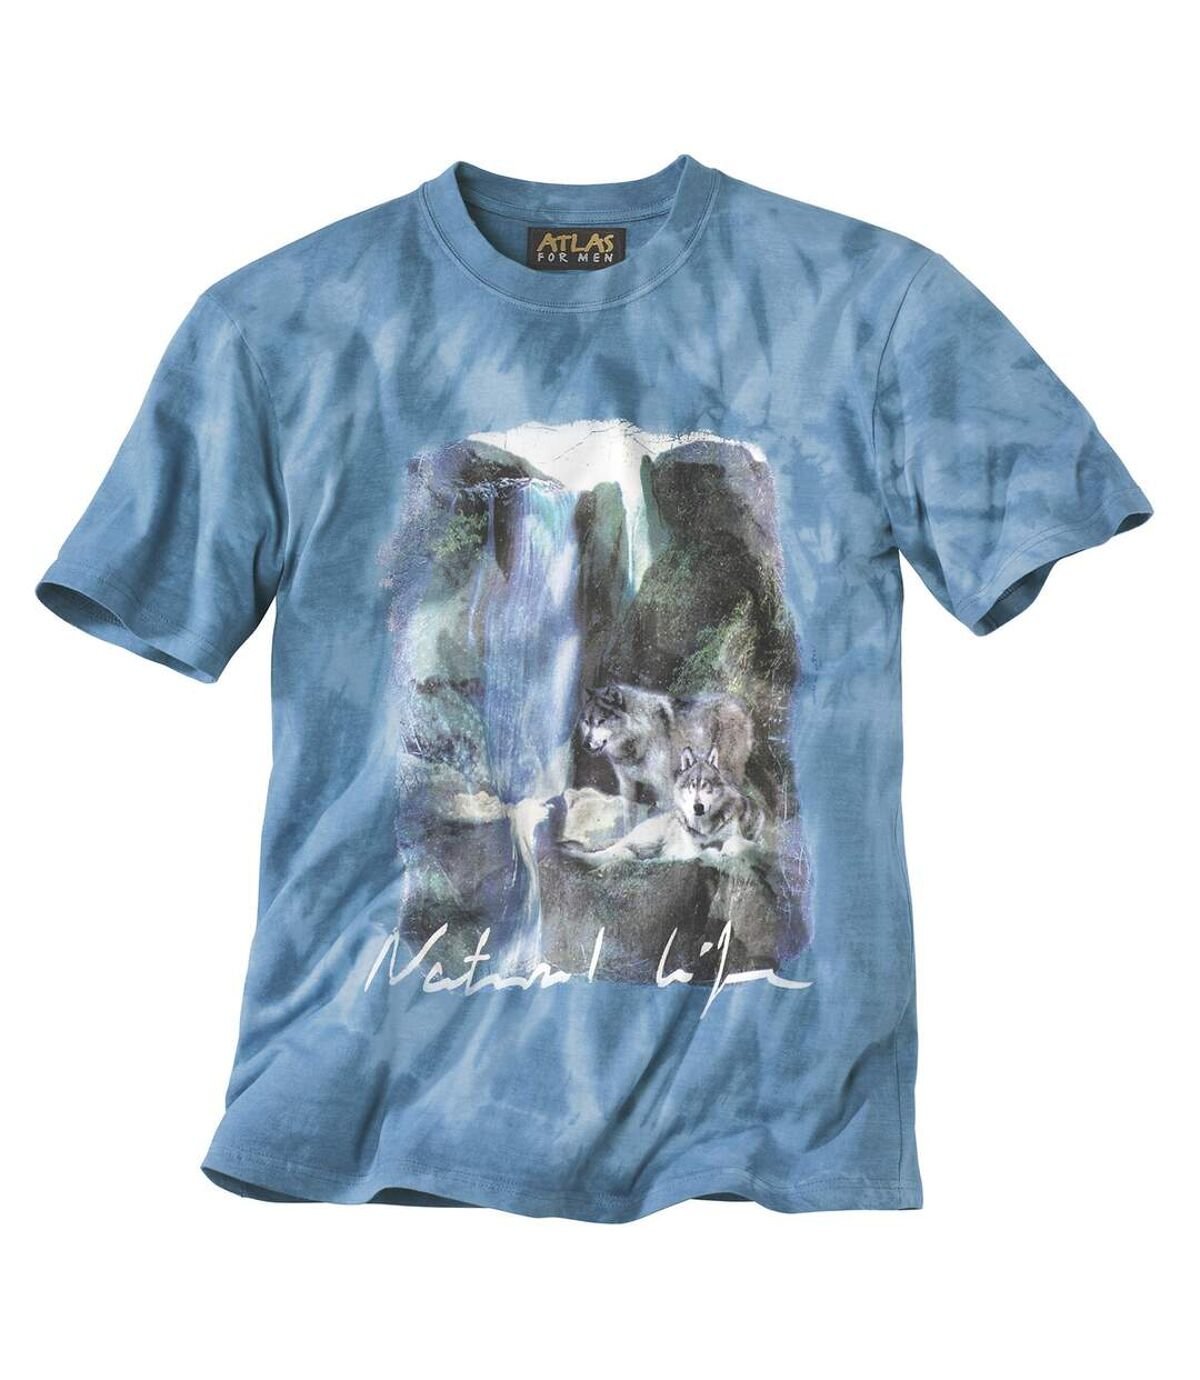 T-shirt Natural Life Atlas For Men